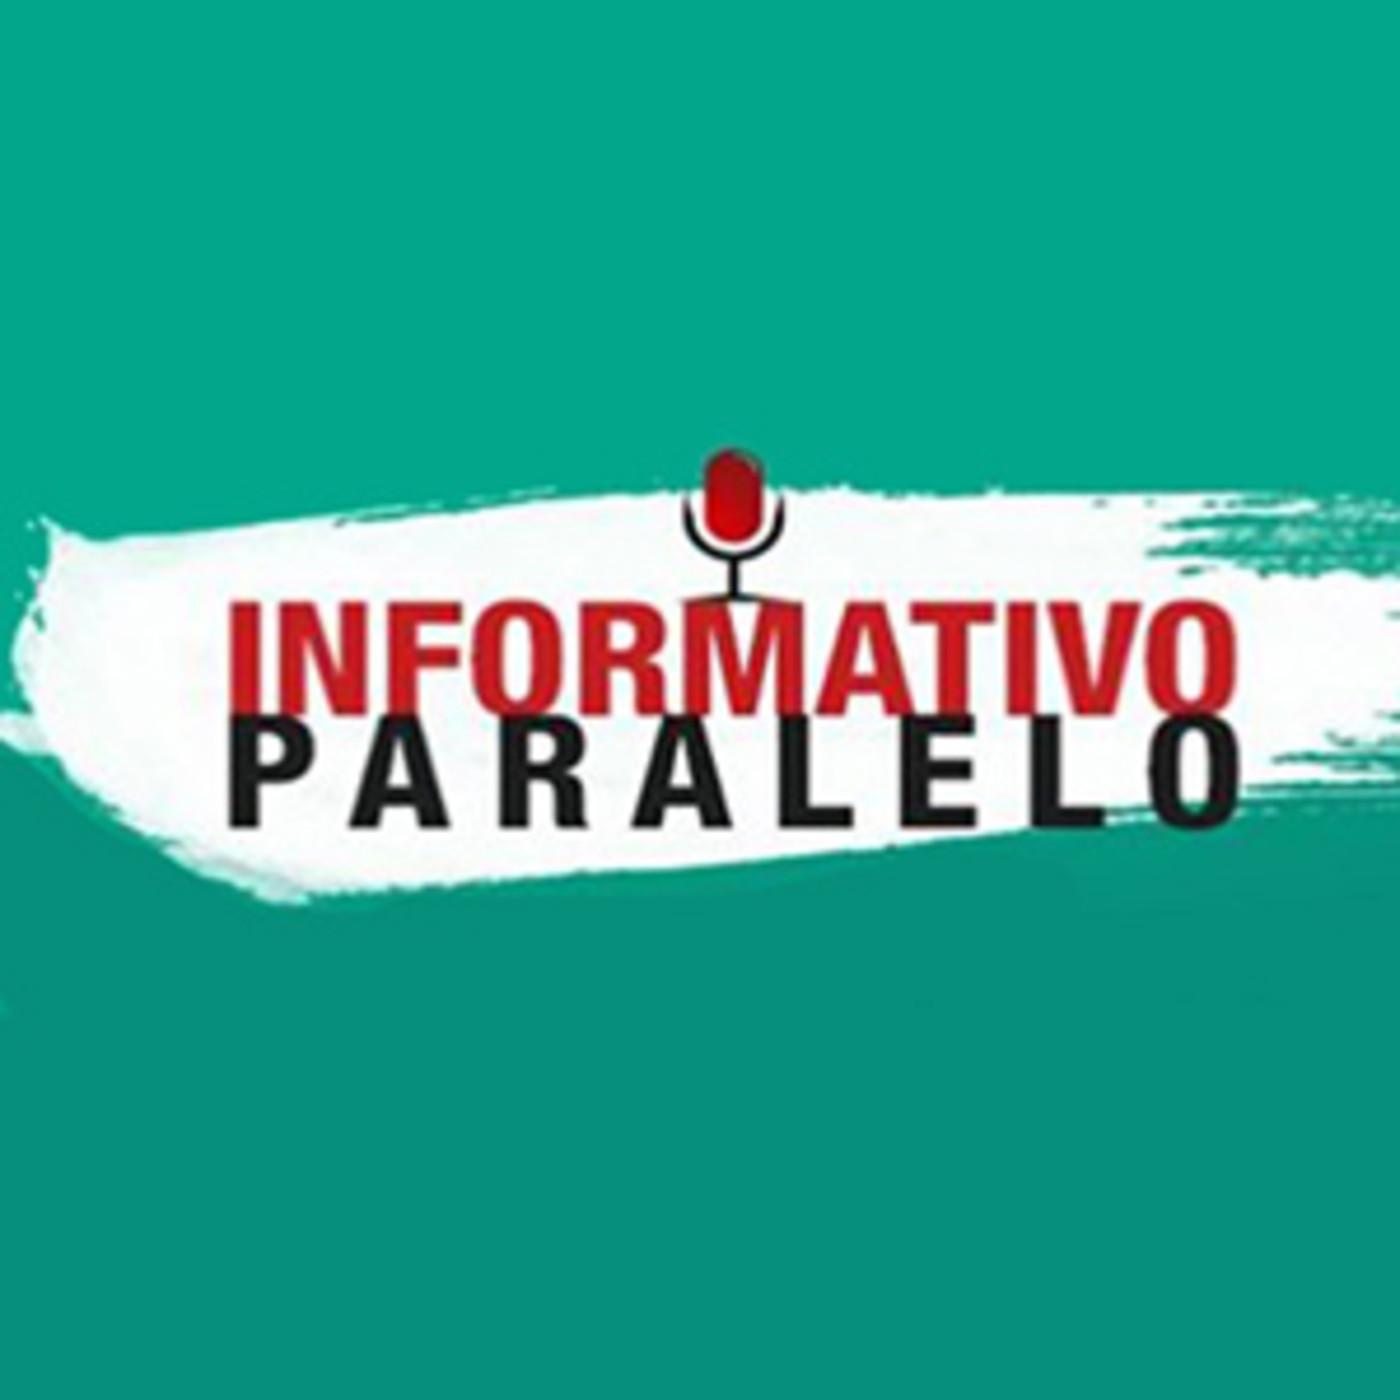 Informativo Paralelo